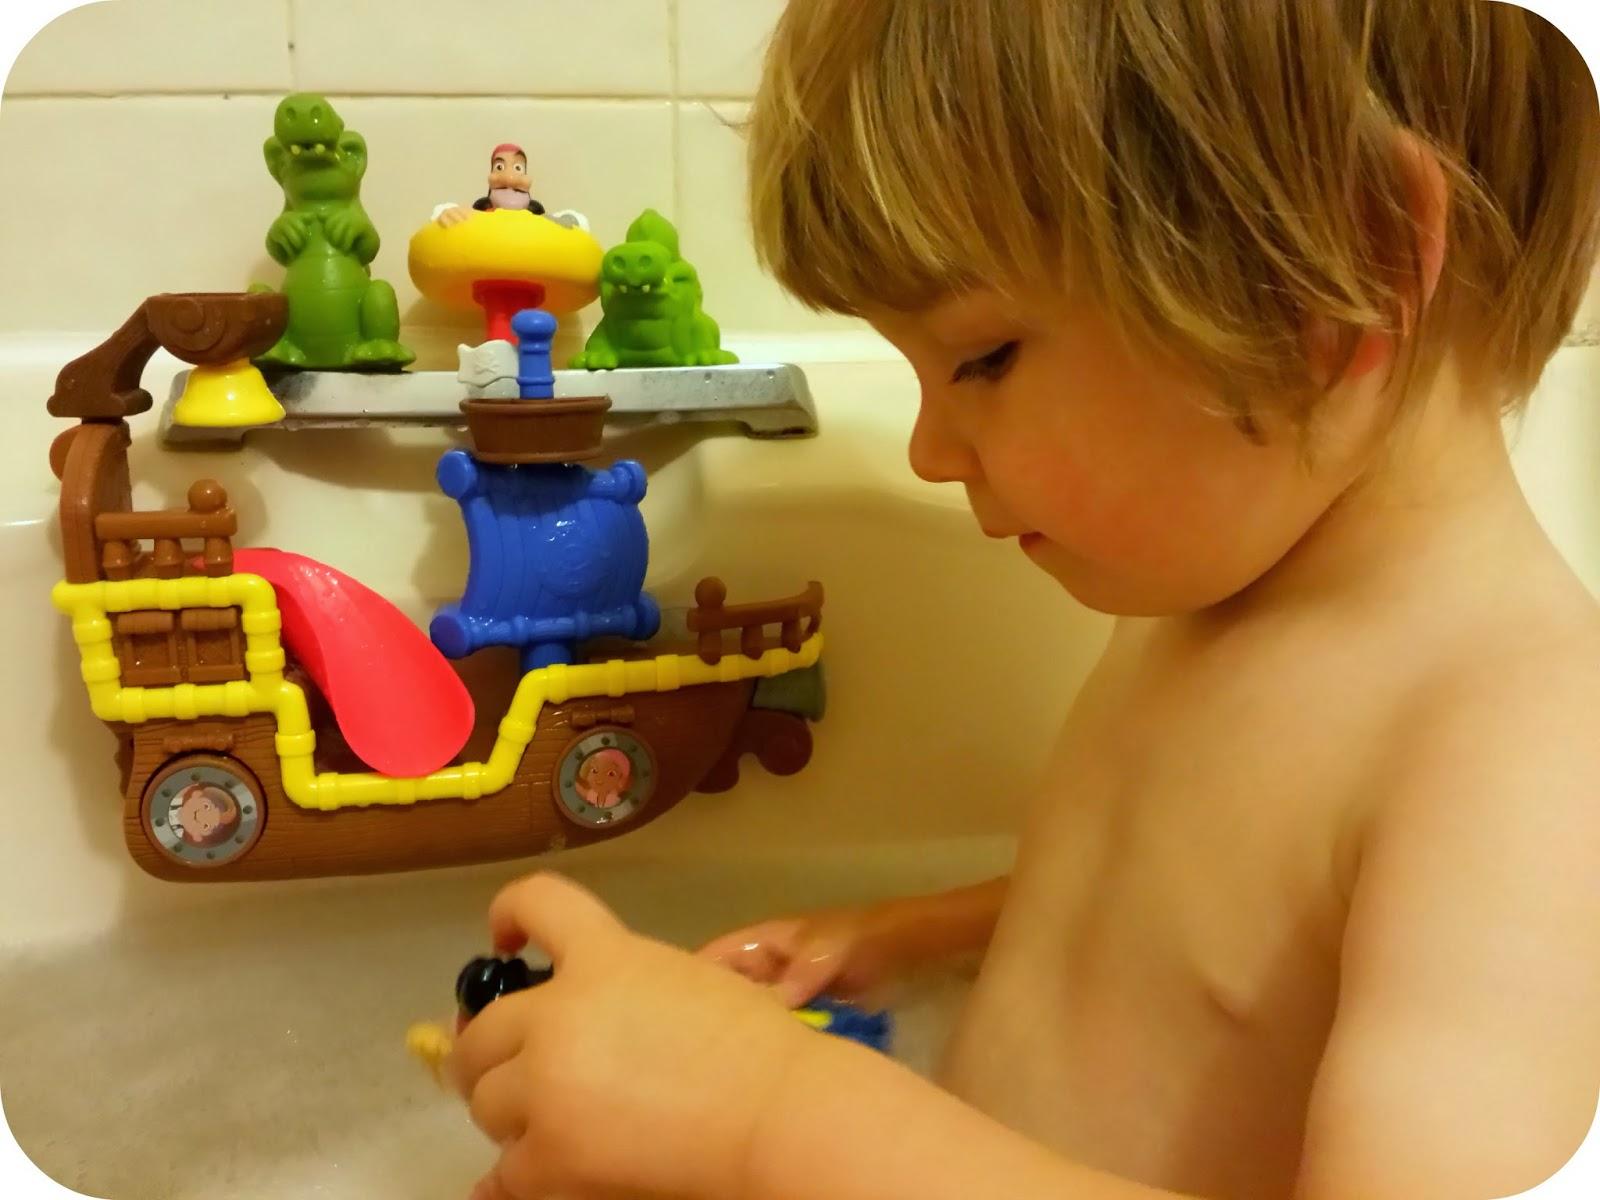 The Adventure of Parenthood: bath toys